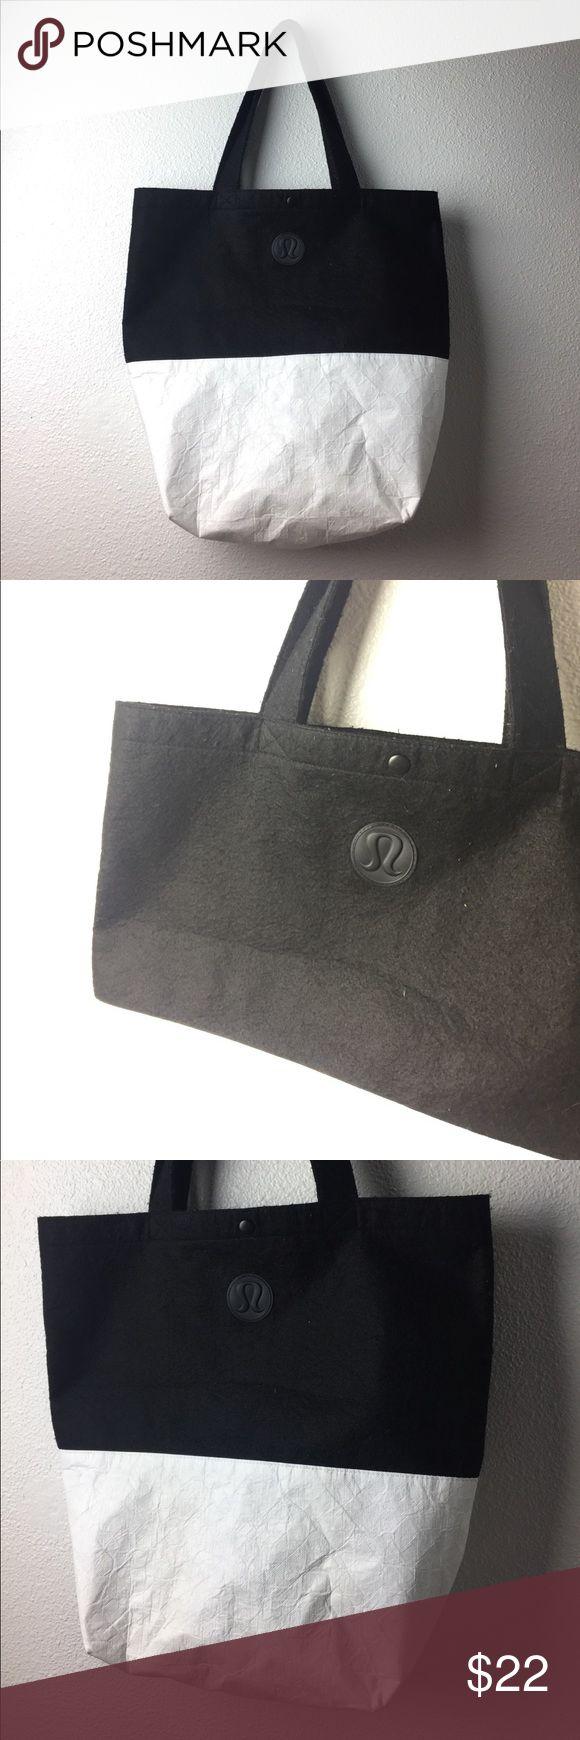 Reusable Lululemon Bag ✨ Used but clean condition. Material on top is Black felt? Nice big spacious bag. lululemon athletica Bags